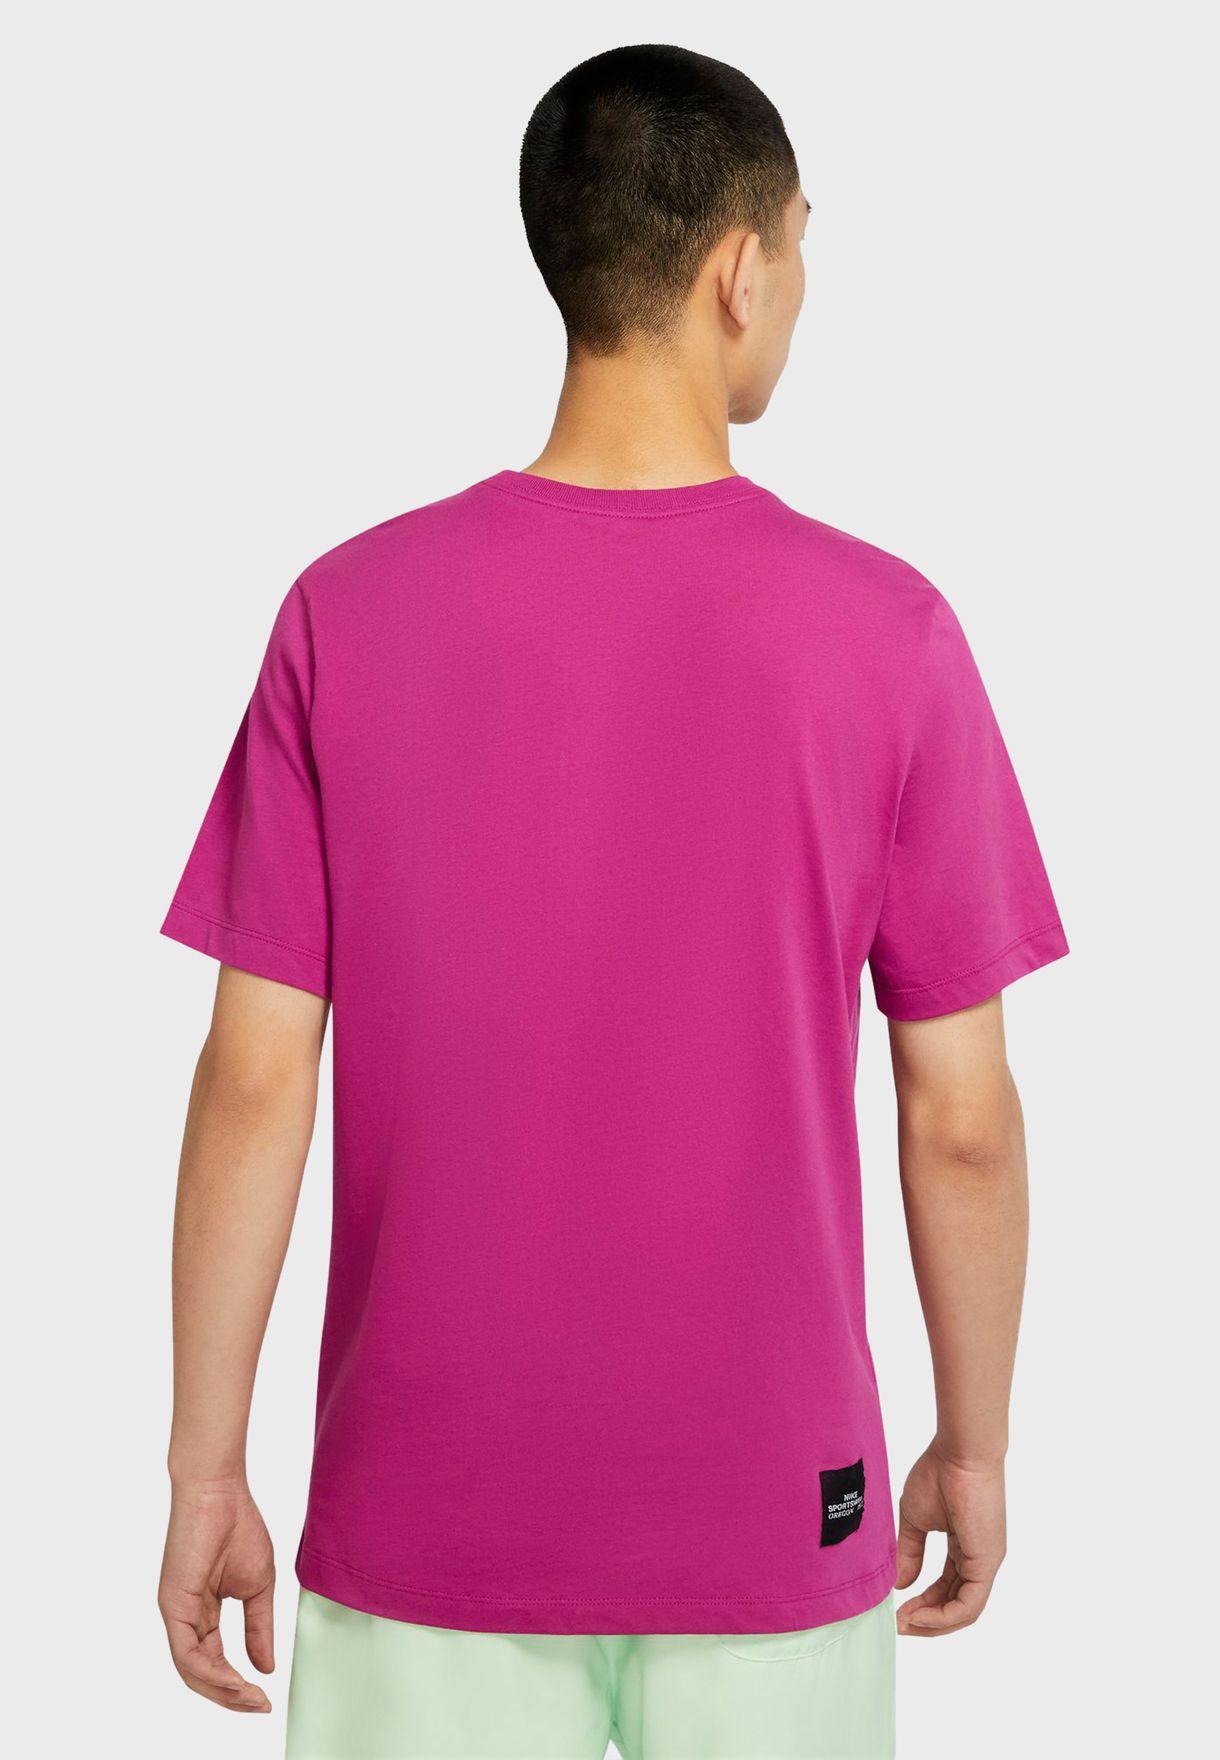 NSW Trend Spike T-Shirt